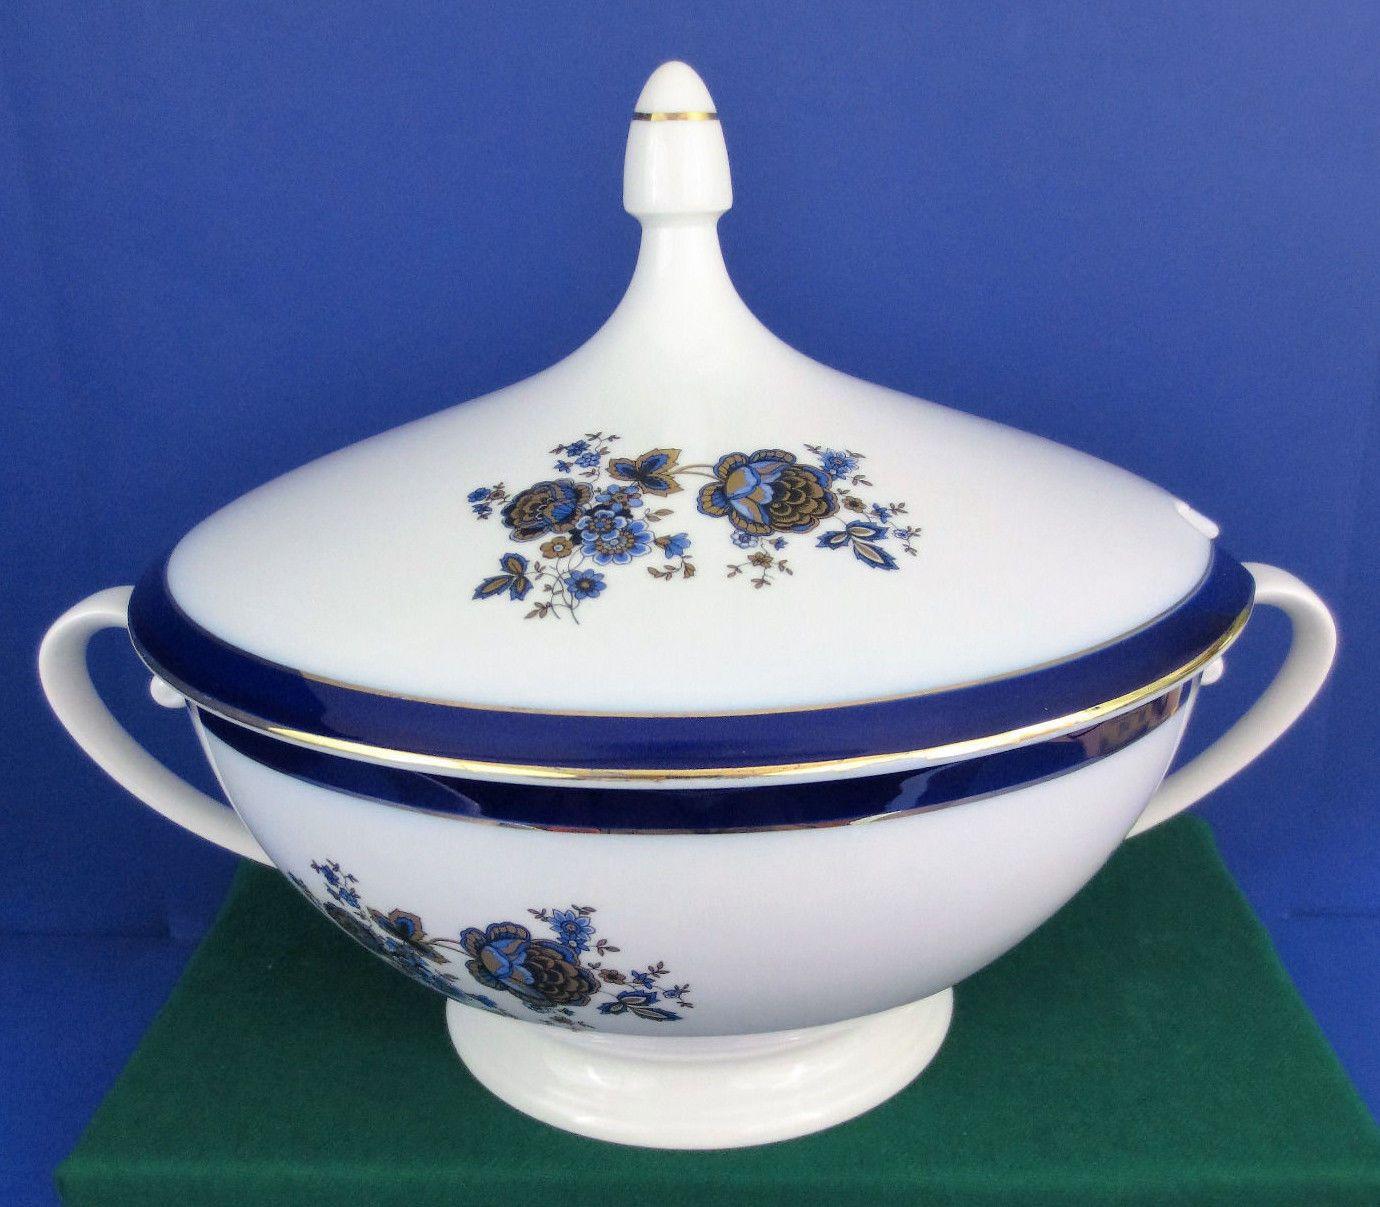 Parini Stoneware Parini Bakeware Stoneware